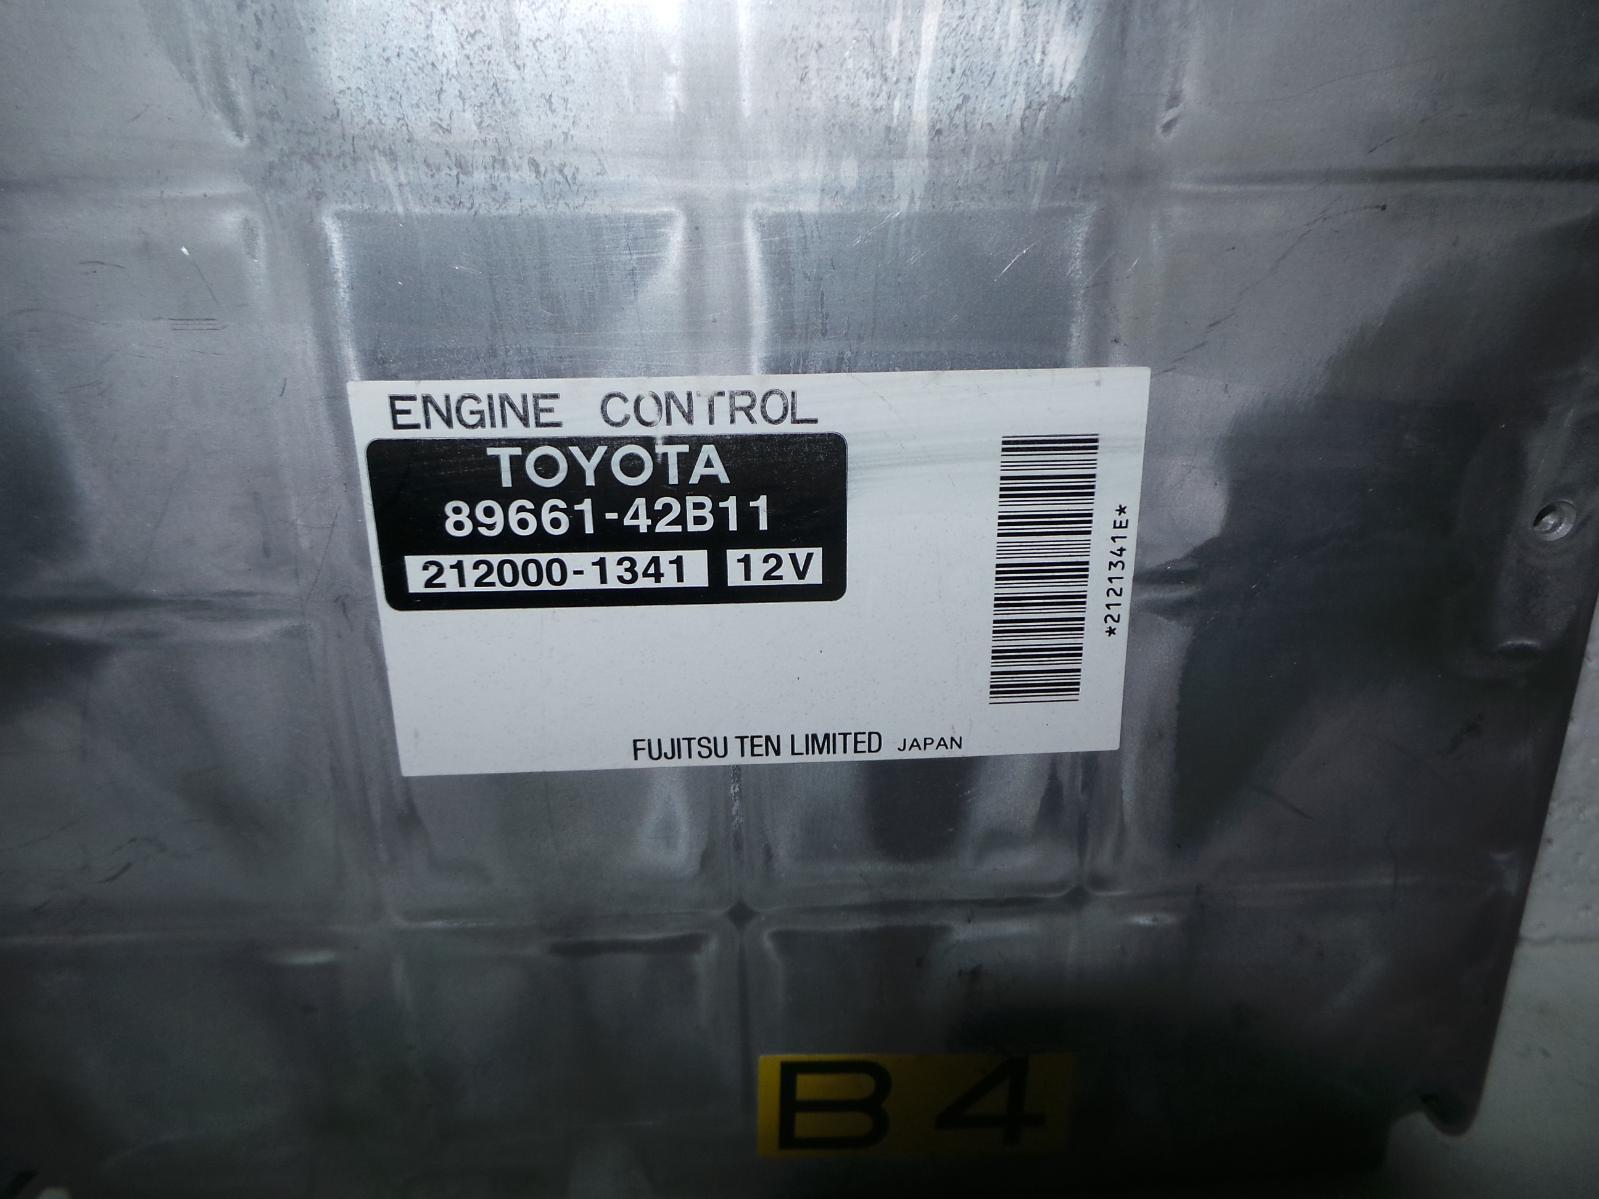 TOYOTA RAV4, Ecu, ENGINE ECU, 2.4, MANUAL T/M TYPE, 89661-42B11, ECU ONLY, ACA2#R, 07/03-10/05